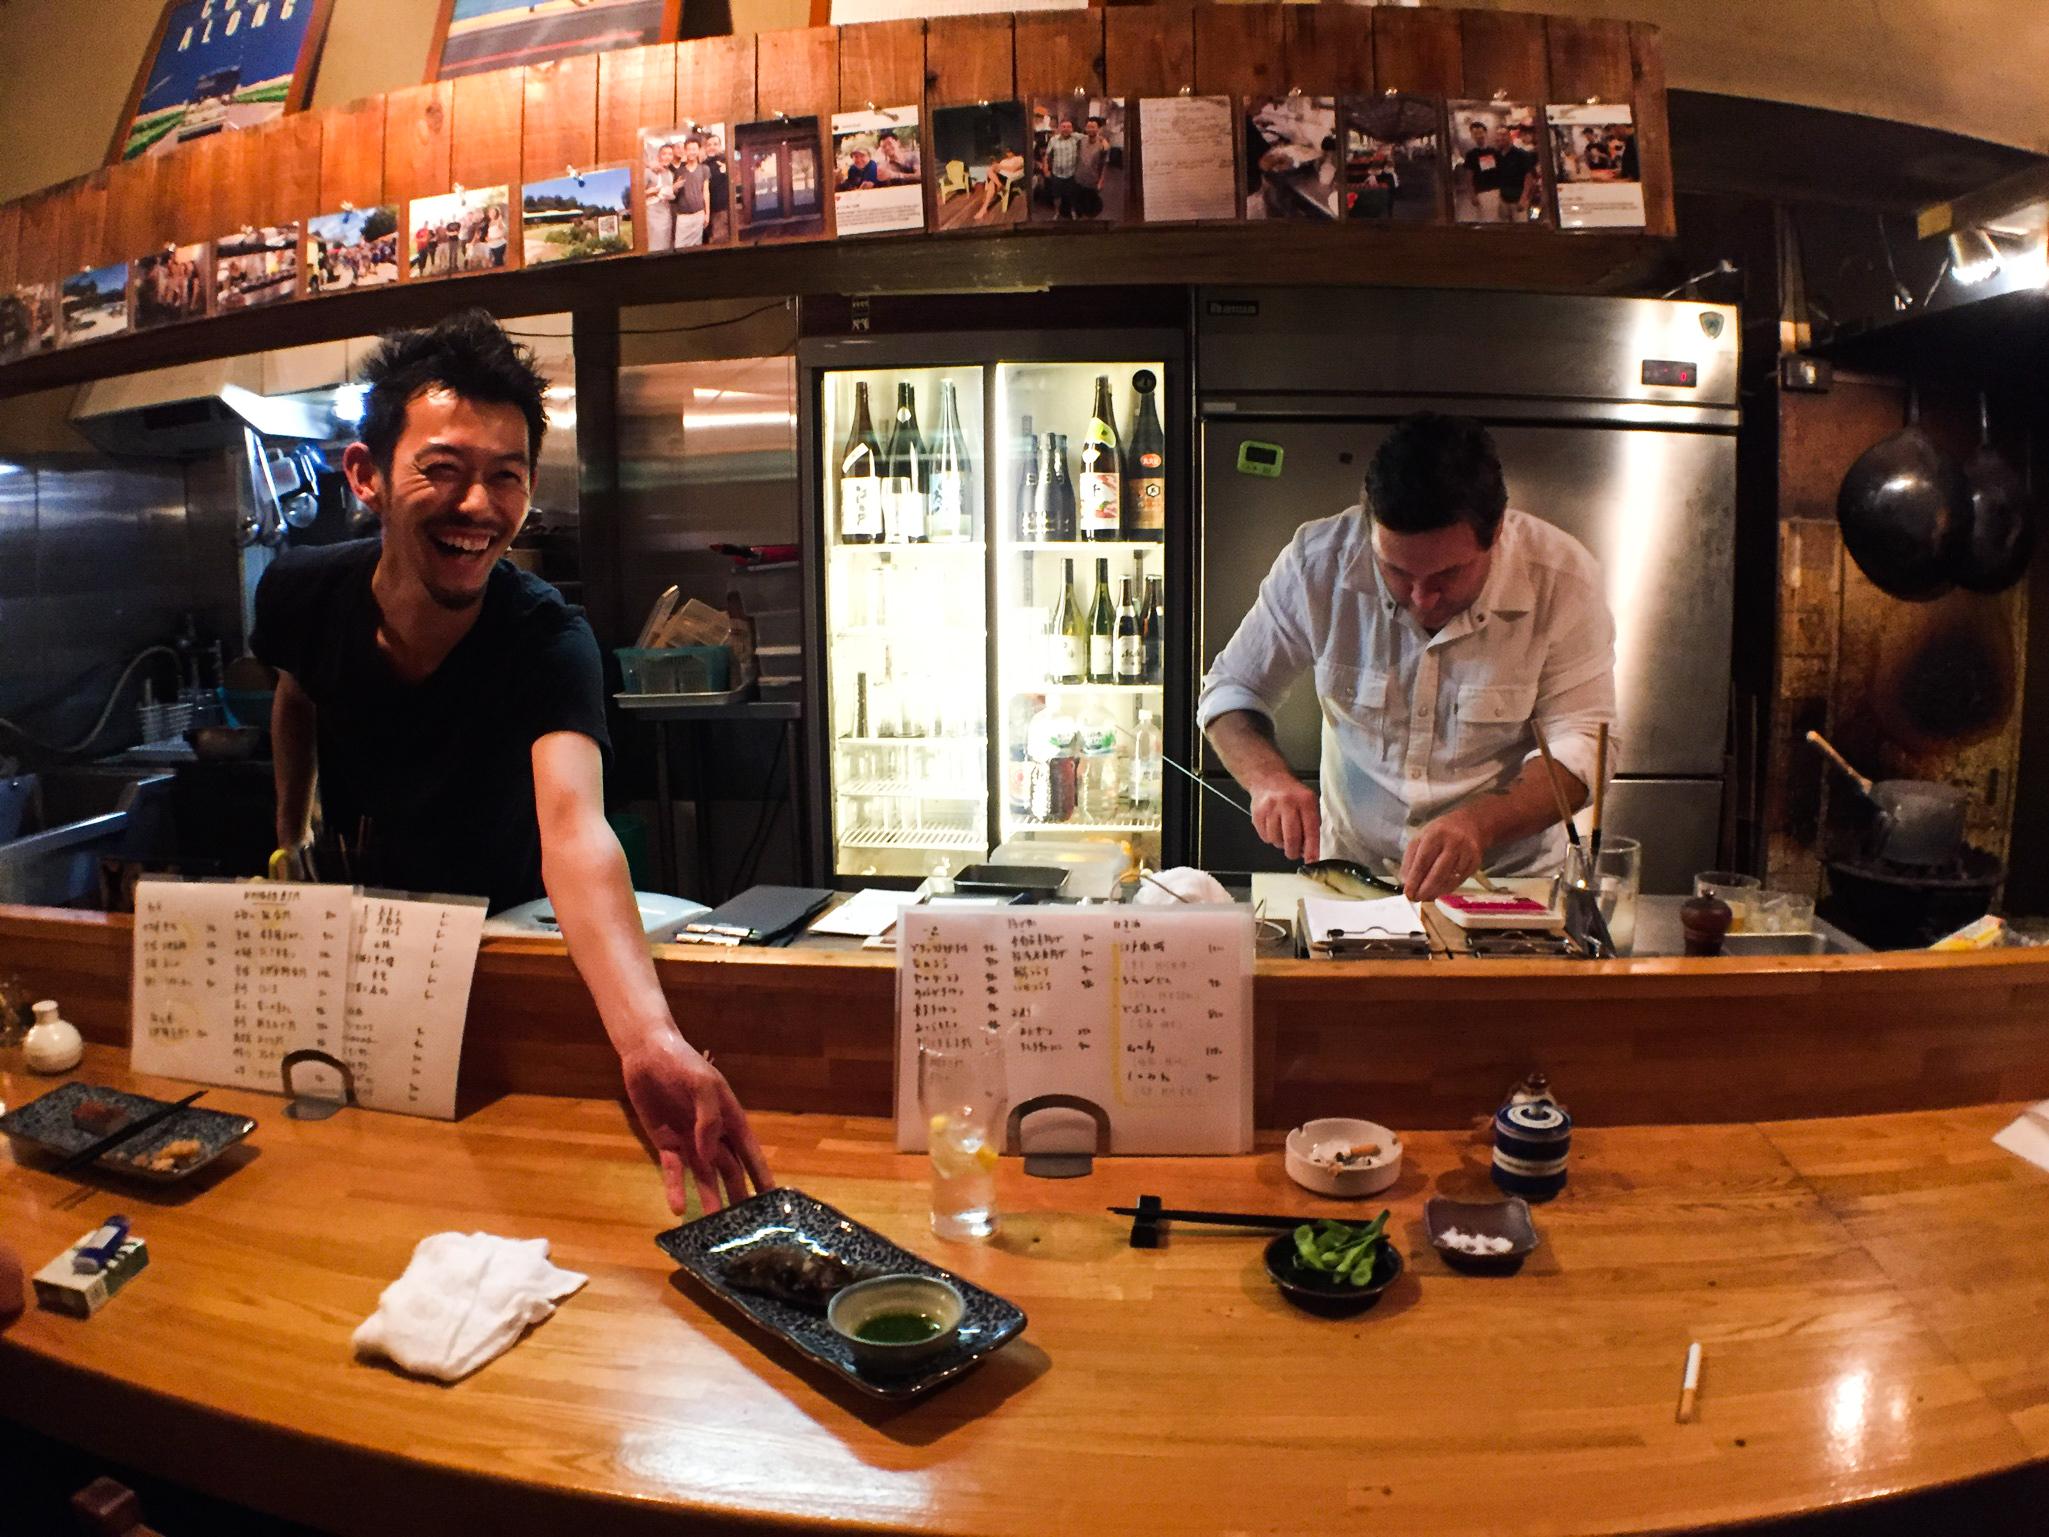 Satoshi and Billy prepare Ayu, a river fish, on skewers at Hiro izakaya.